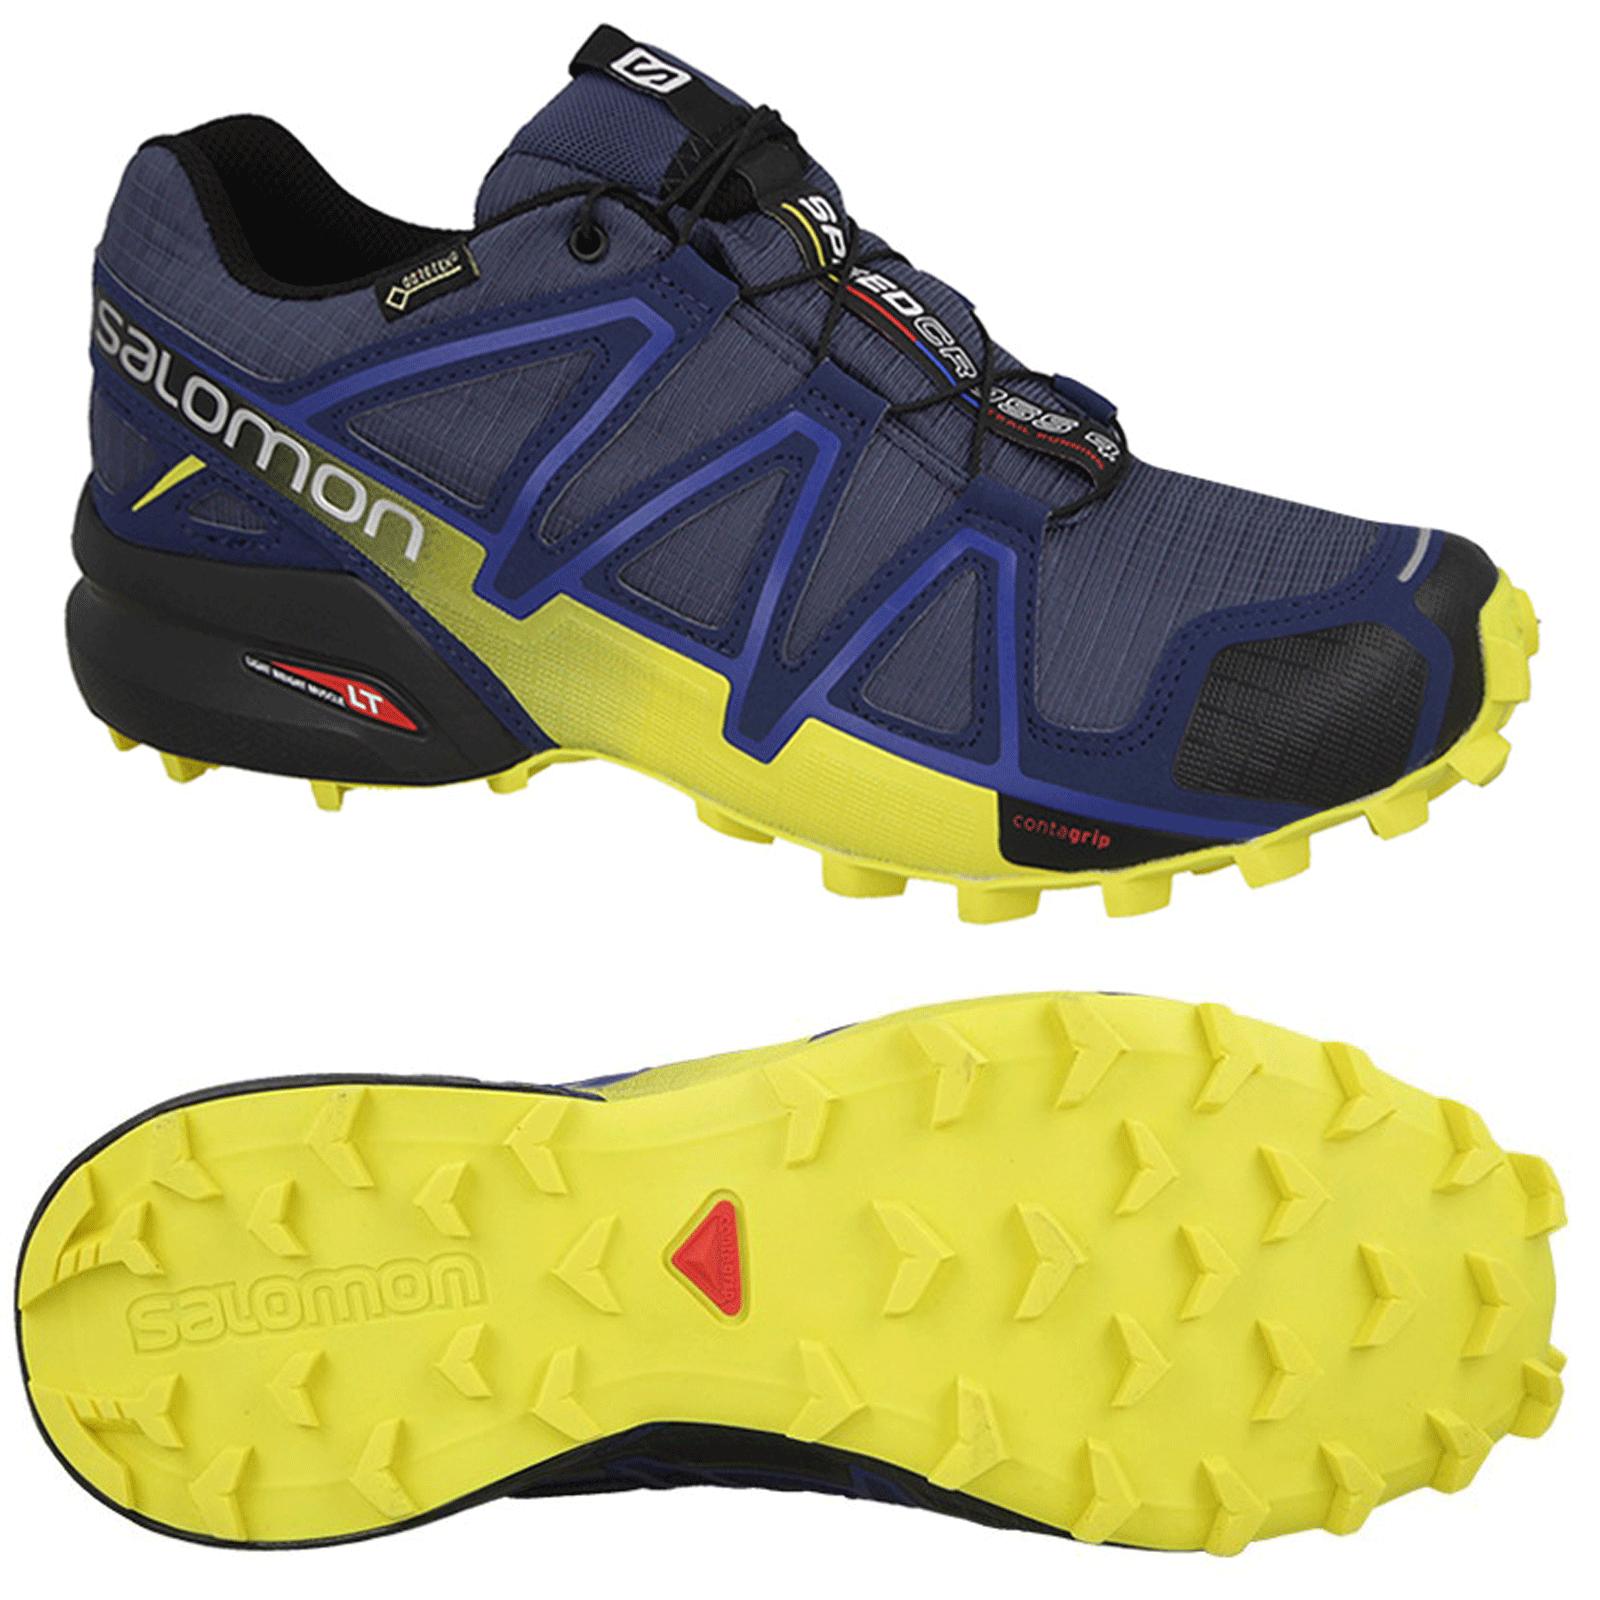 Salomon SPEEDCROSS 4 4 4 GTX Herren Laufschuhe Trailrunning Schuhe GORETEX 42,5 Neu 1d6263